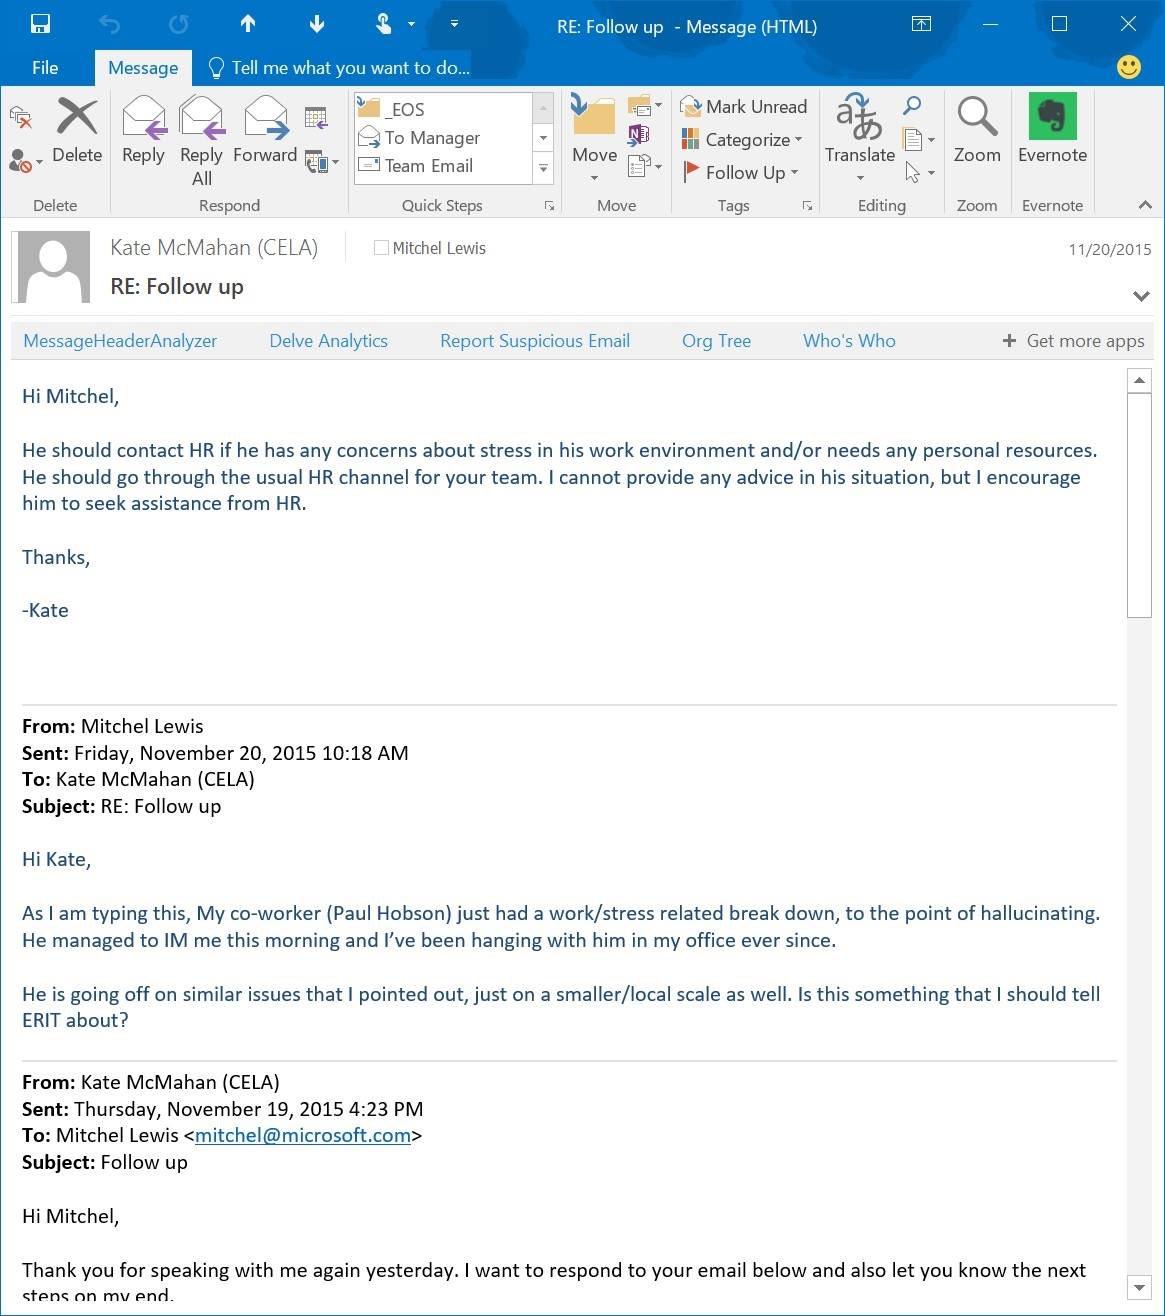 Paul Hobson e-mail #2